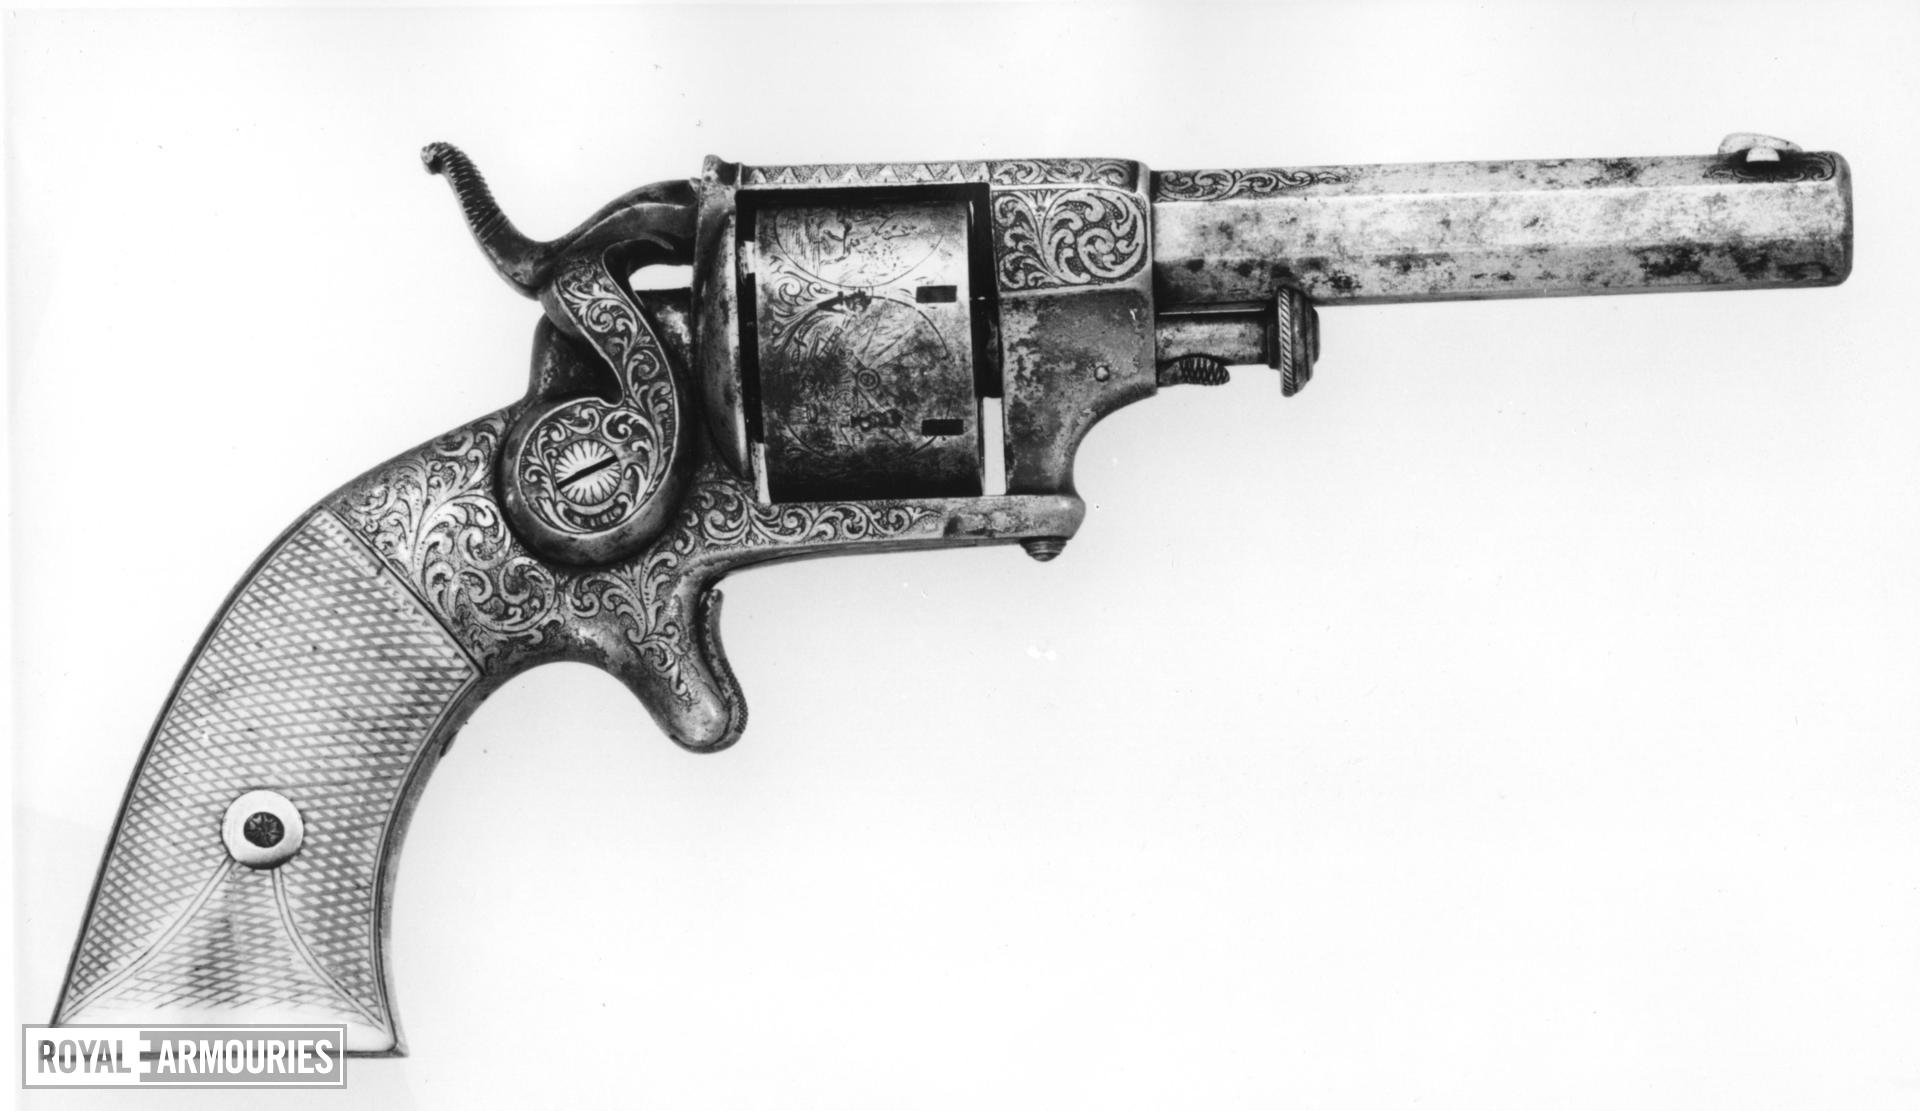 Rimfire seven-shot revolver - Allen Pattern 1858